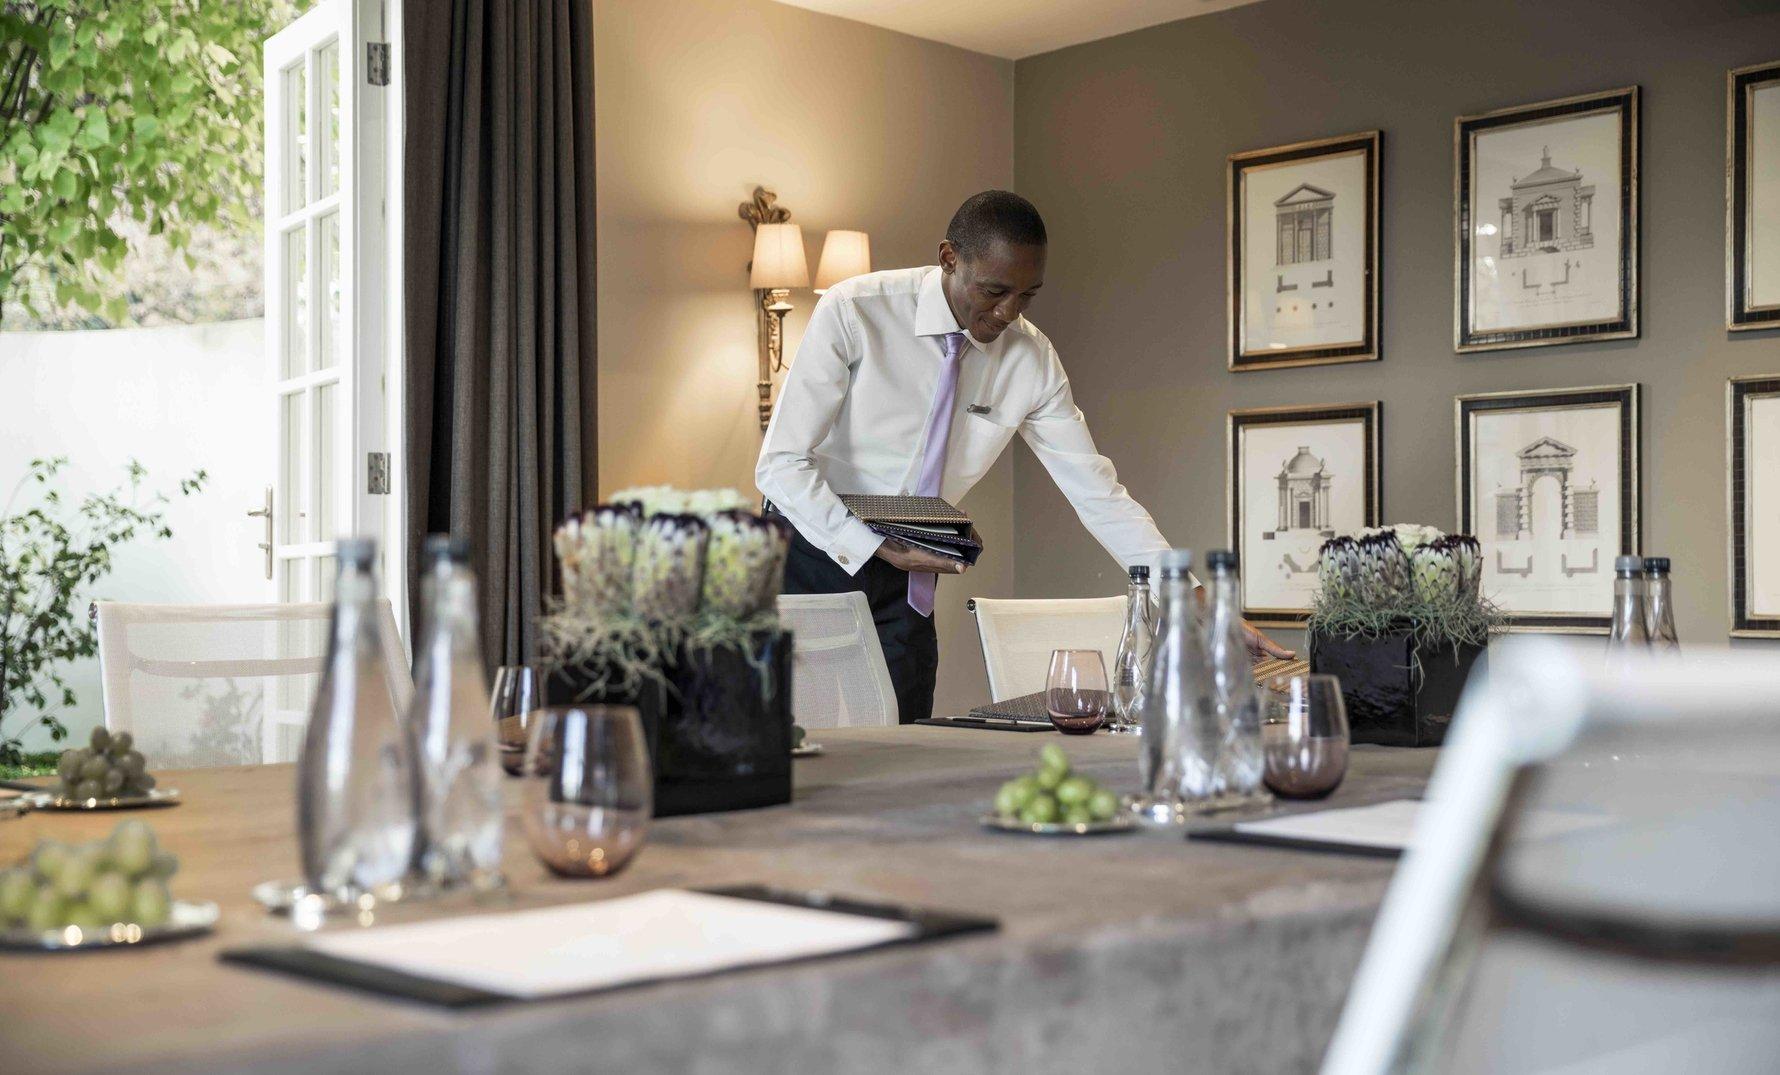 Meetings at Four Seasons Hotel The Westcliff